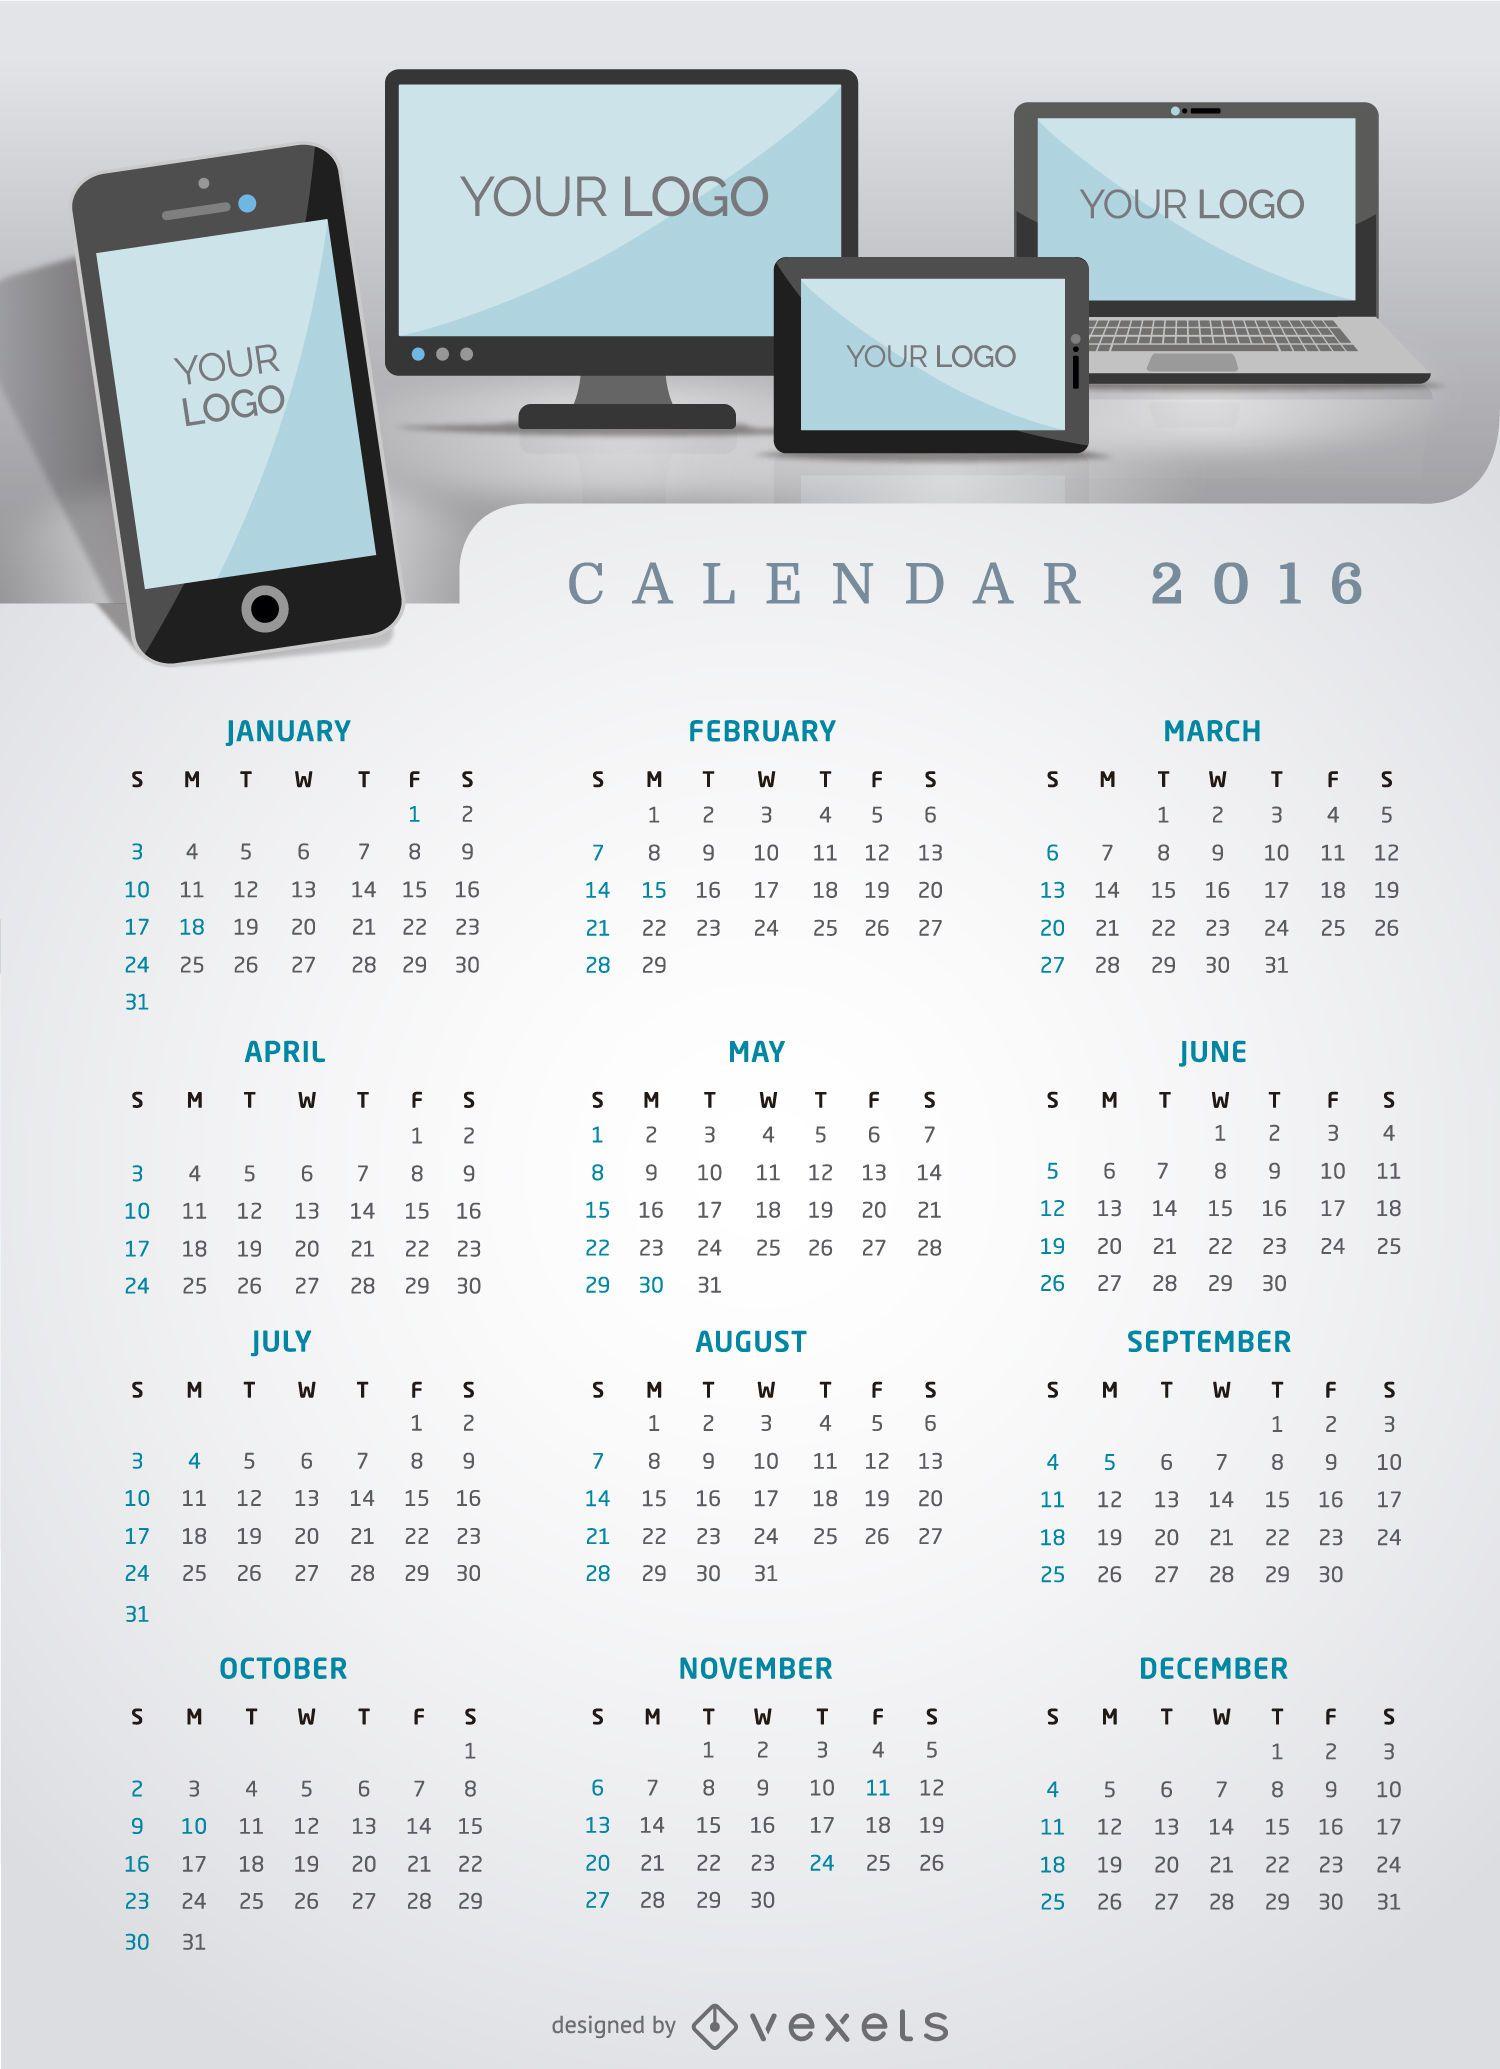 Calendar 2016 multiplatform app or website